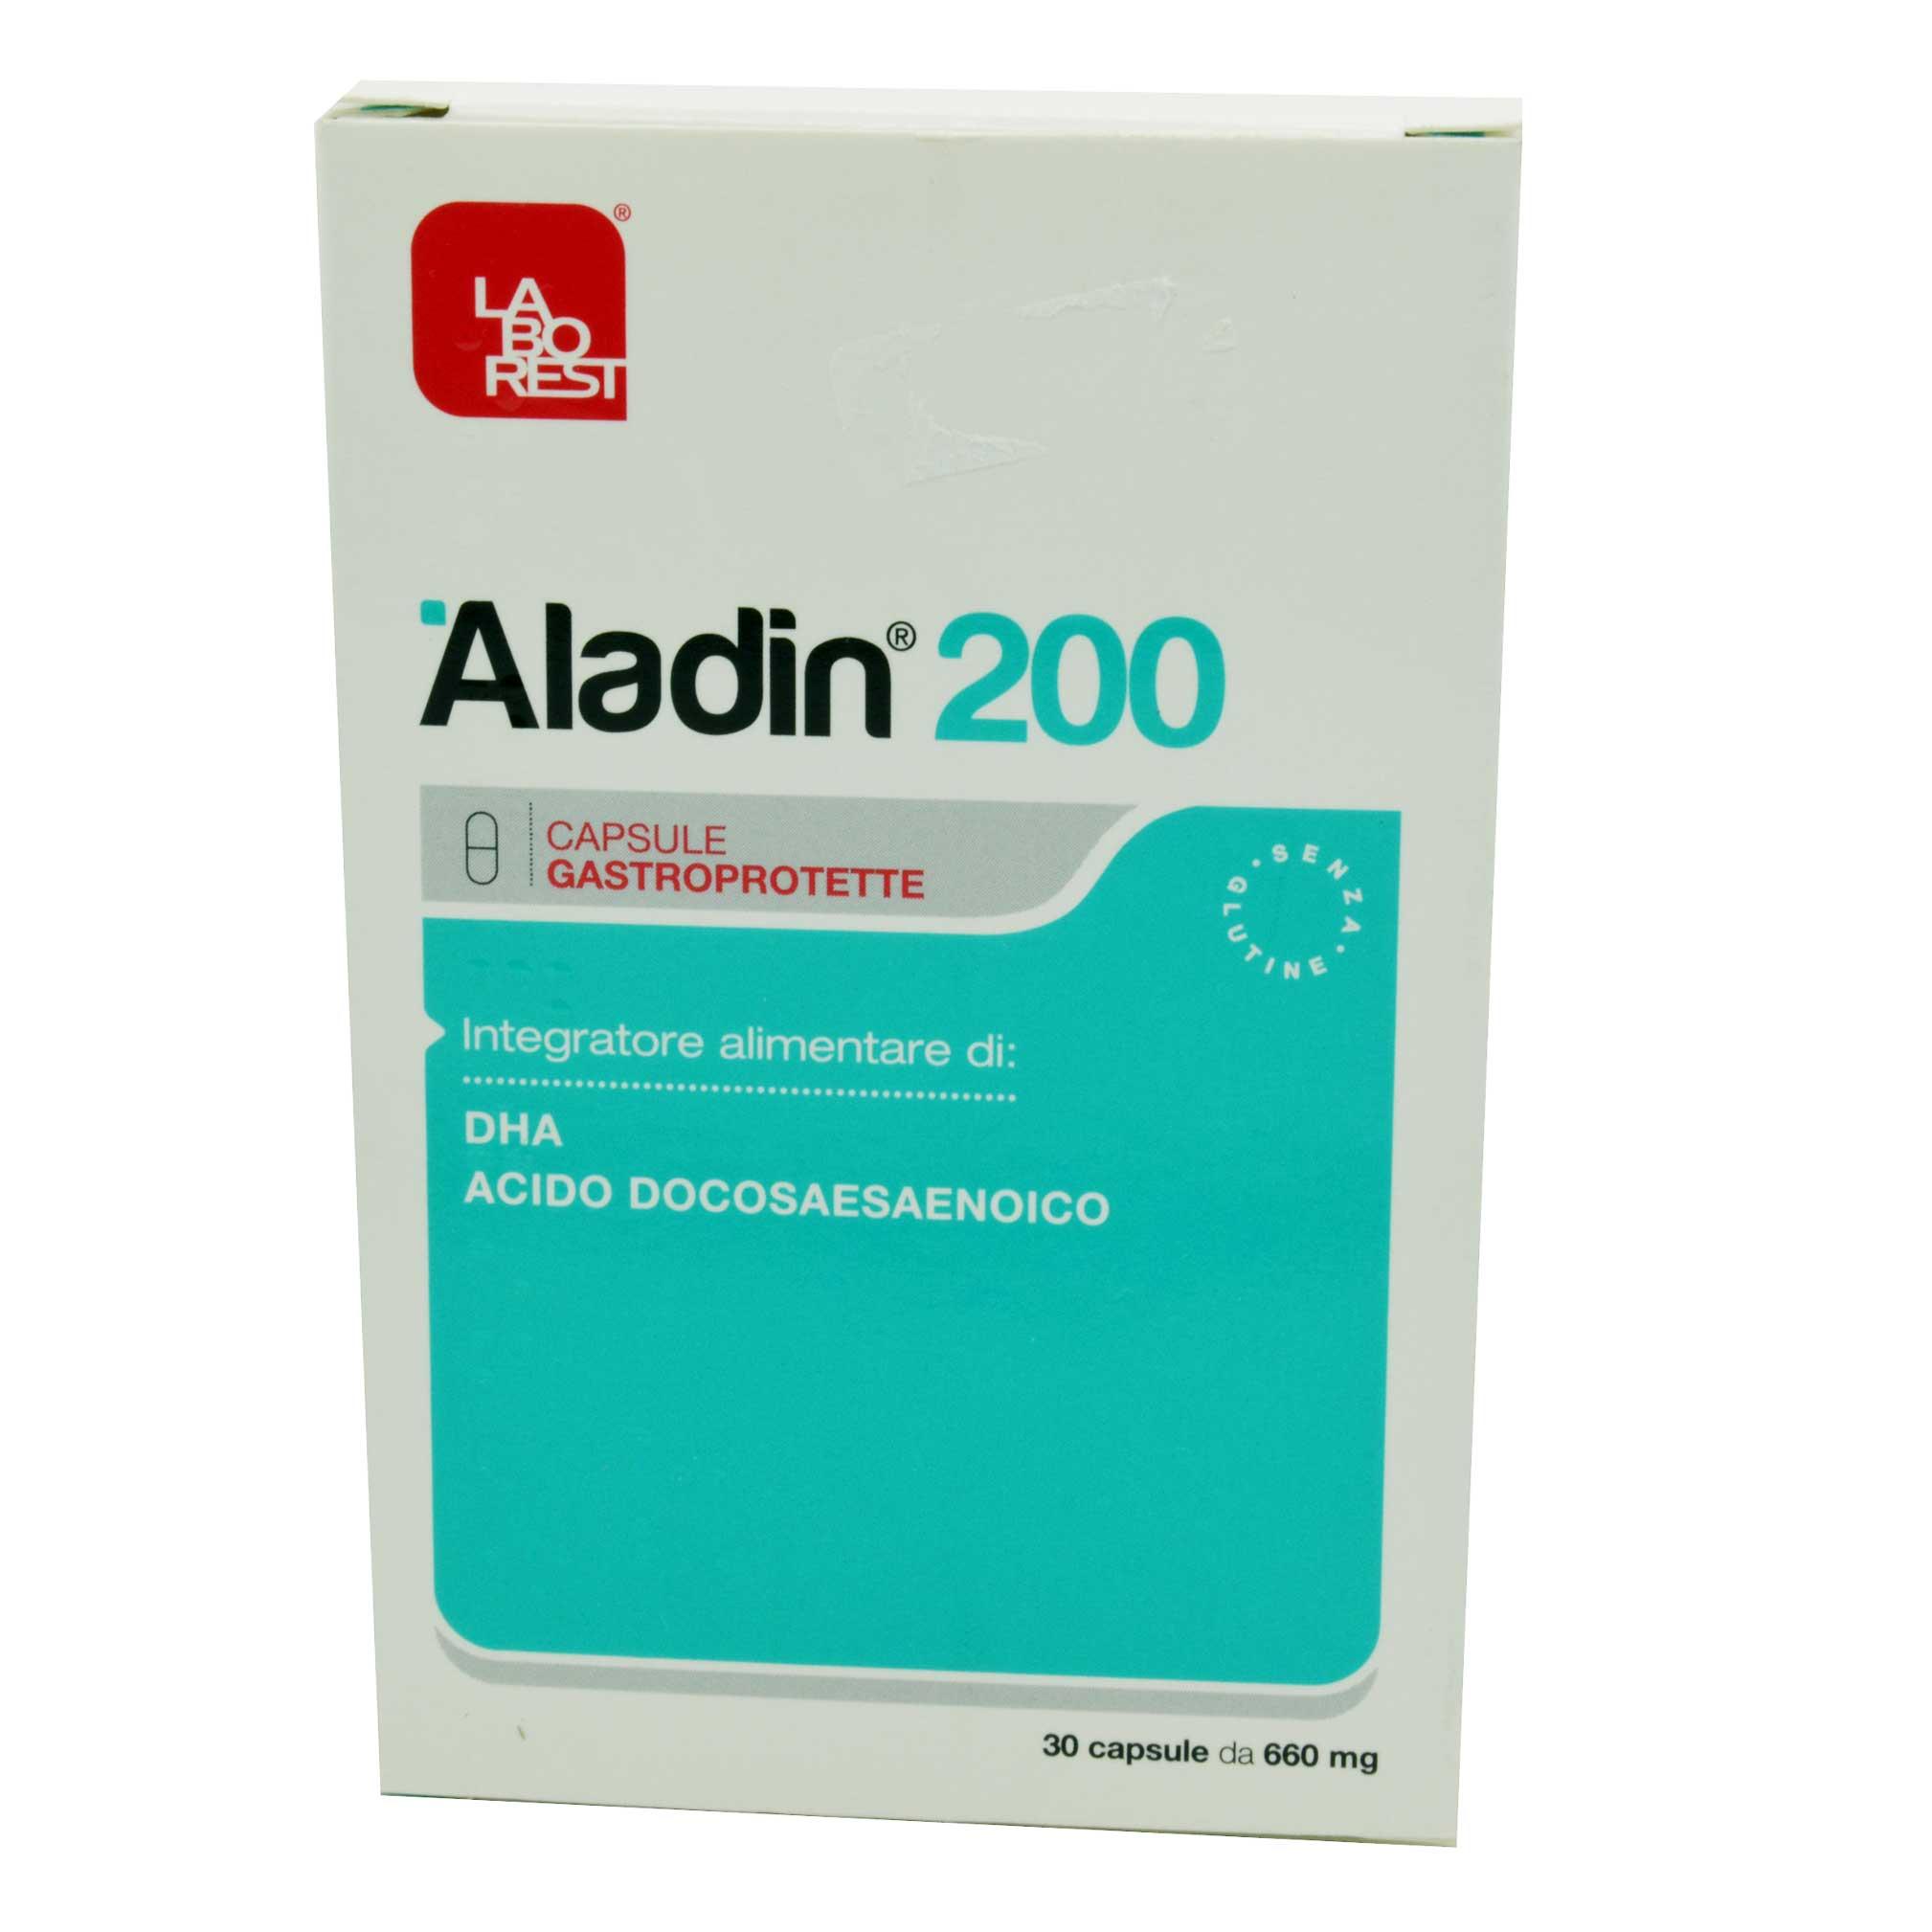 Aladin 200 DHA CAPSULE GASTROPROTETTE